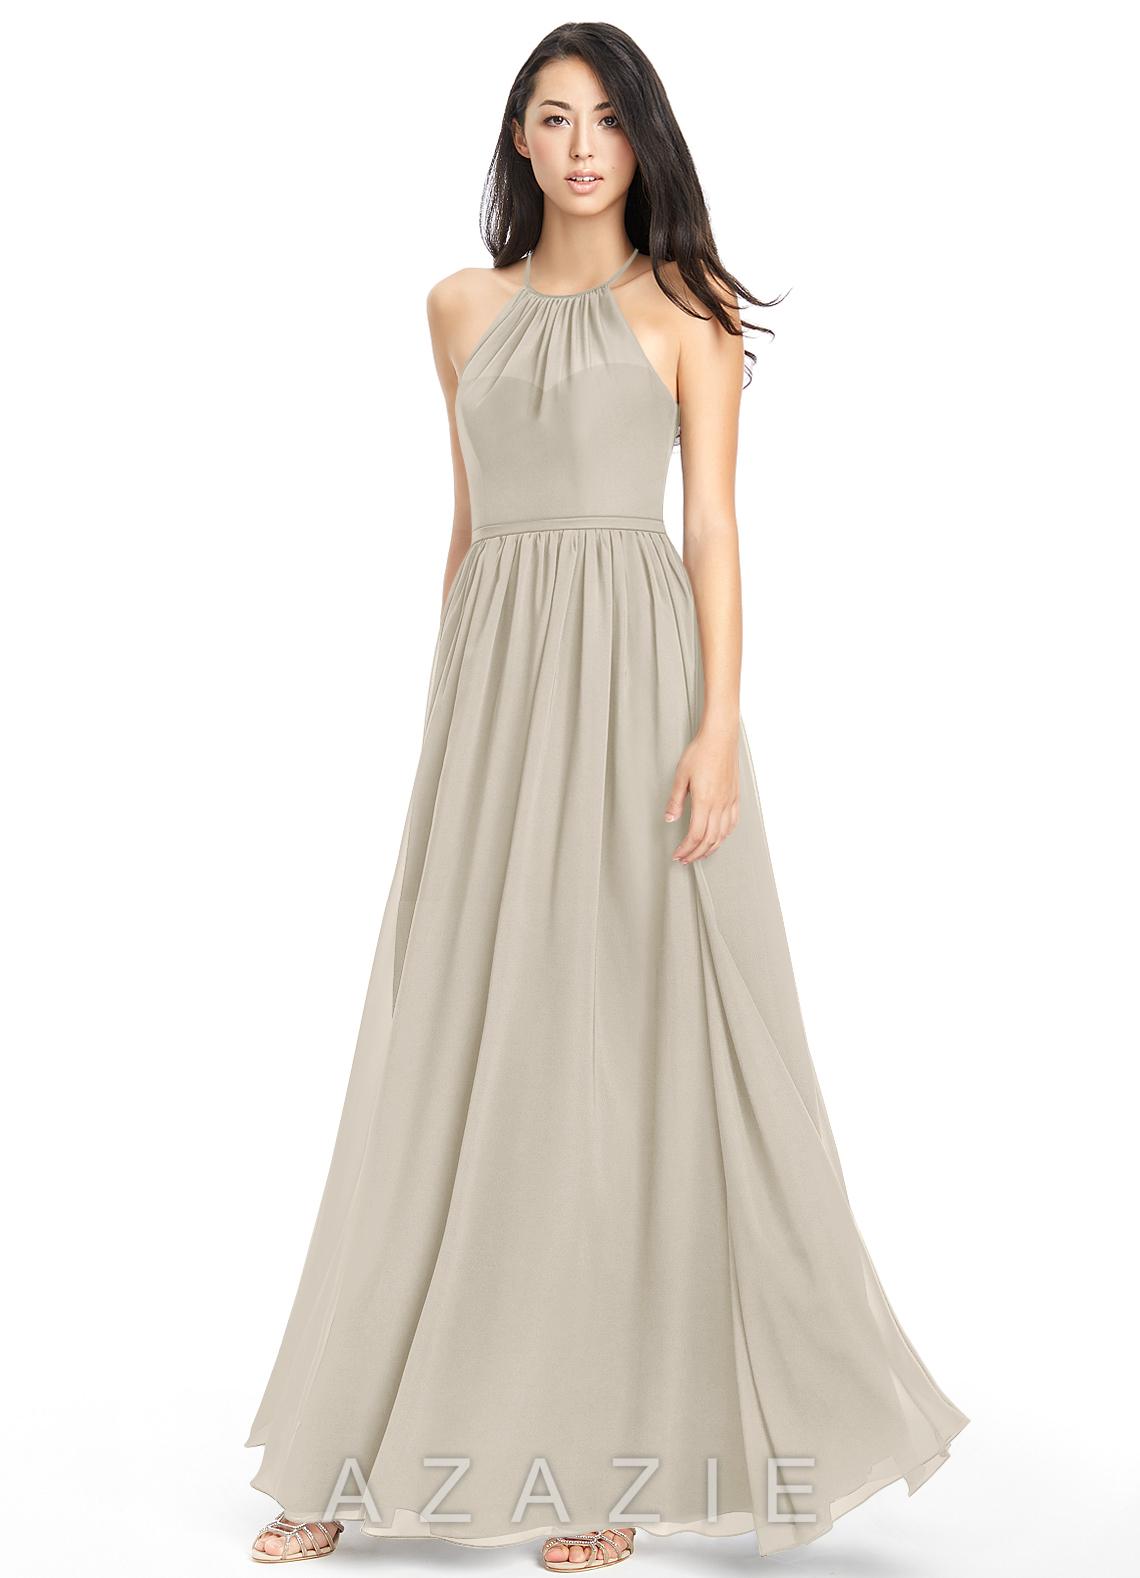 Bridesmaid dresses bridesmaid gowns azazie azazie kailyn azazie kailyn ombrellifo Image collections